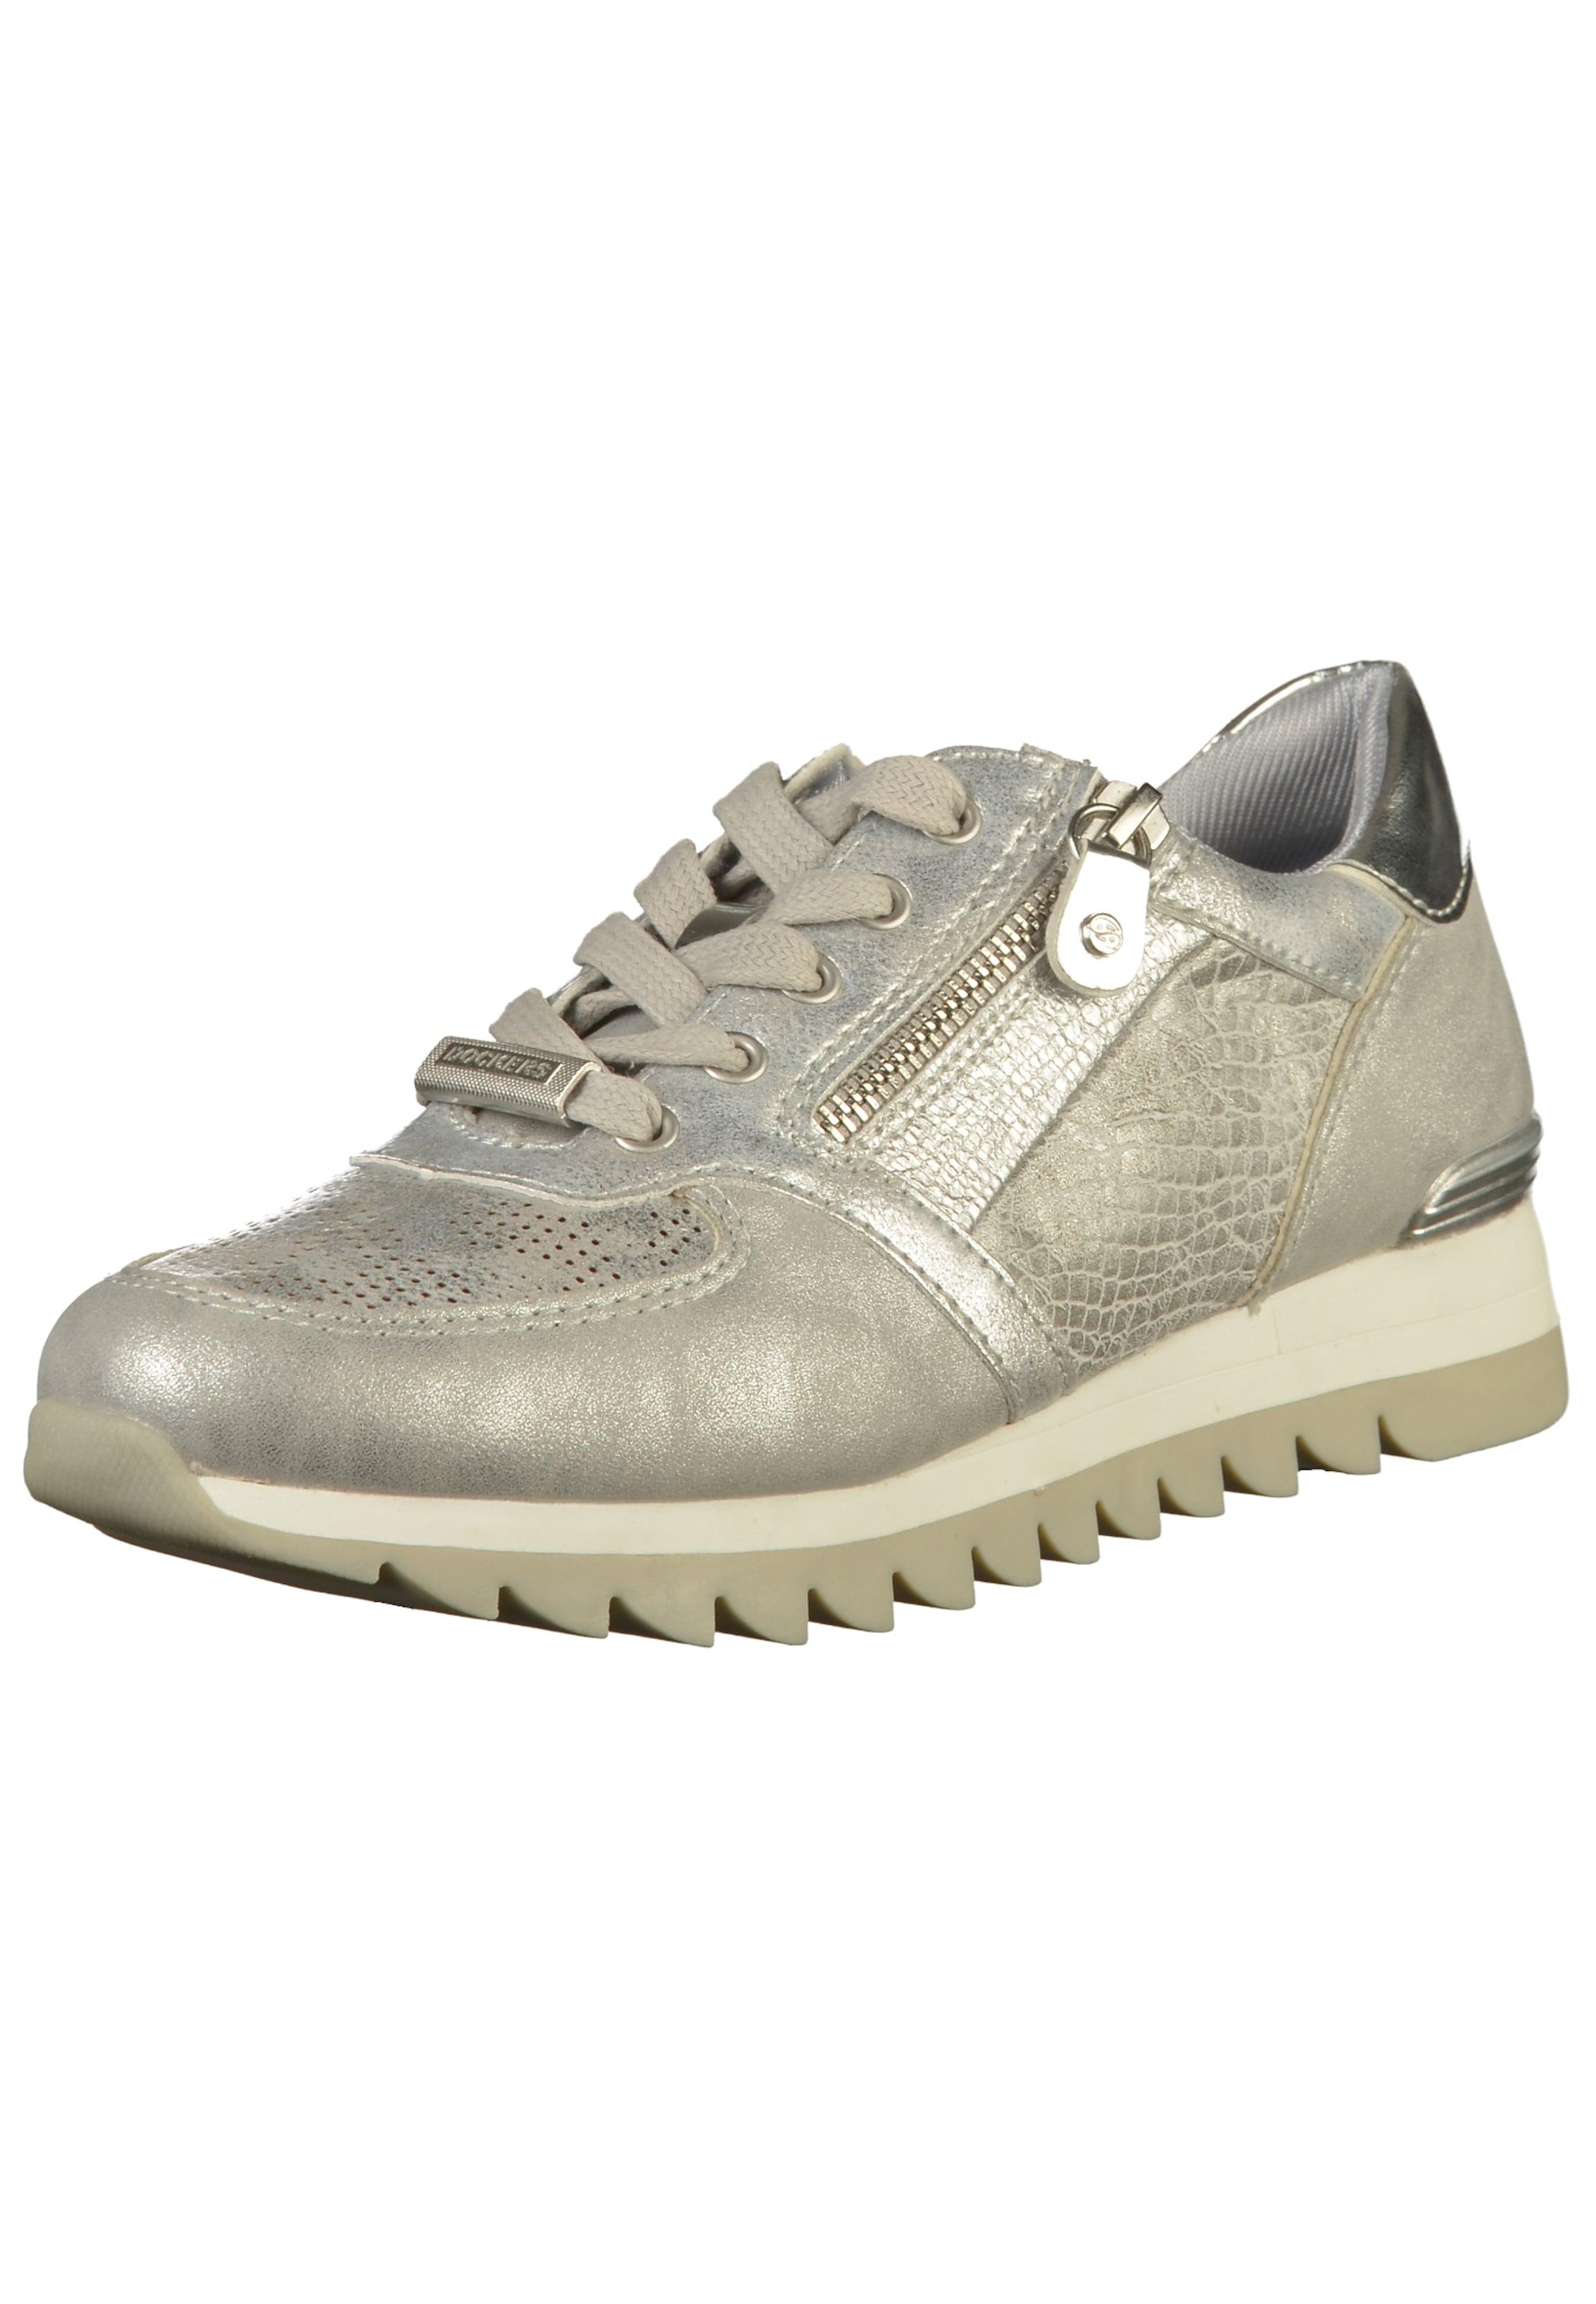 Dockers by Gerli Sneaker Verschleißfeste billige Schuhe